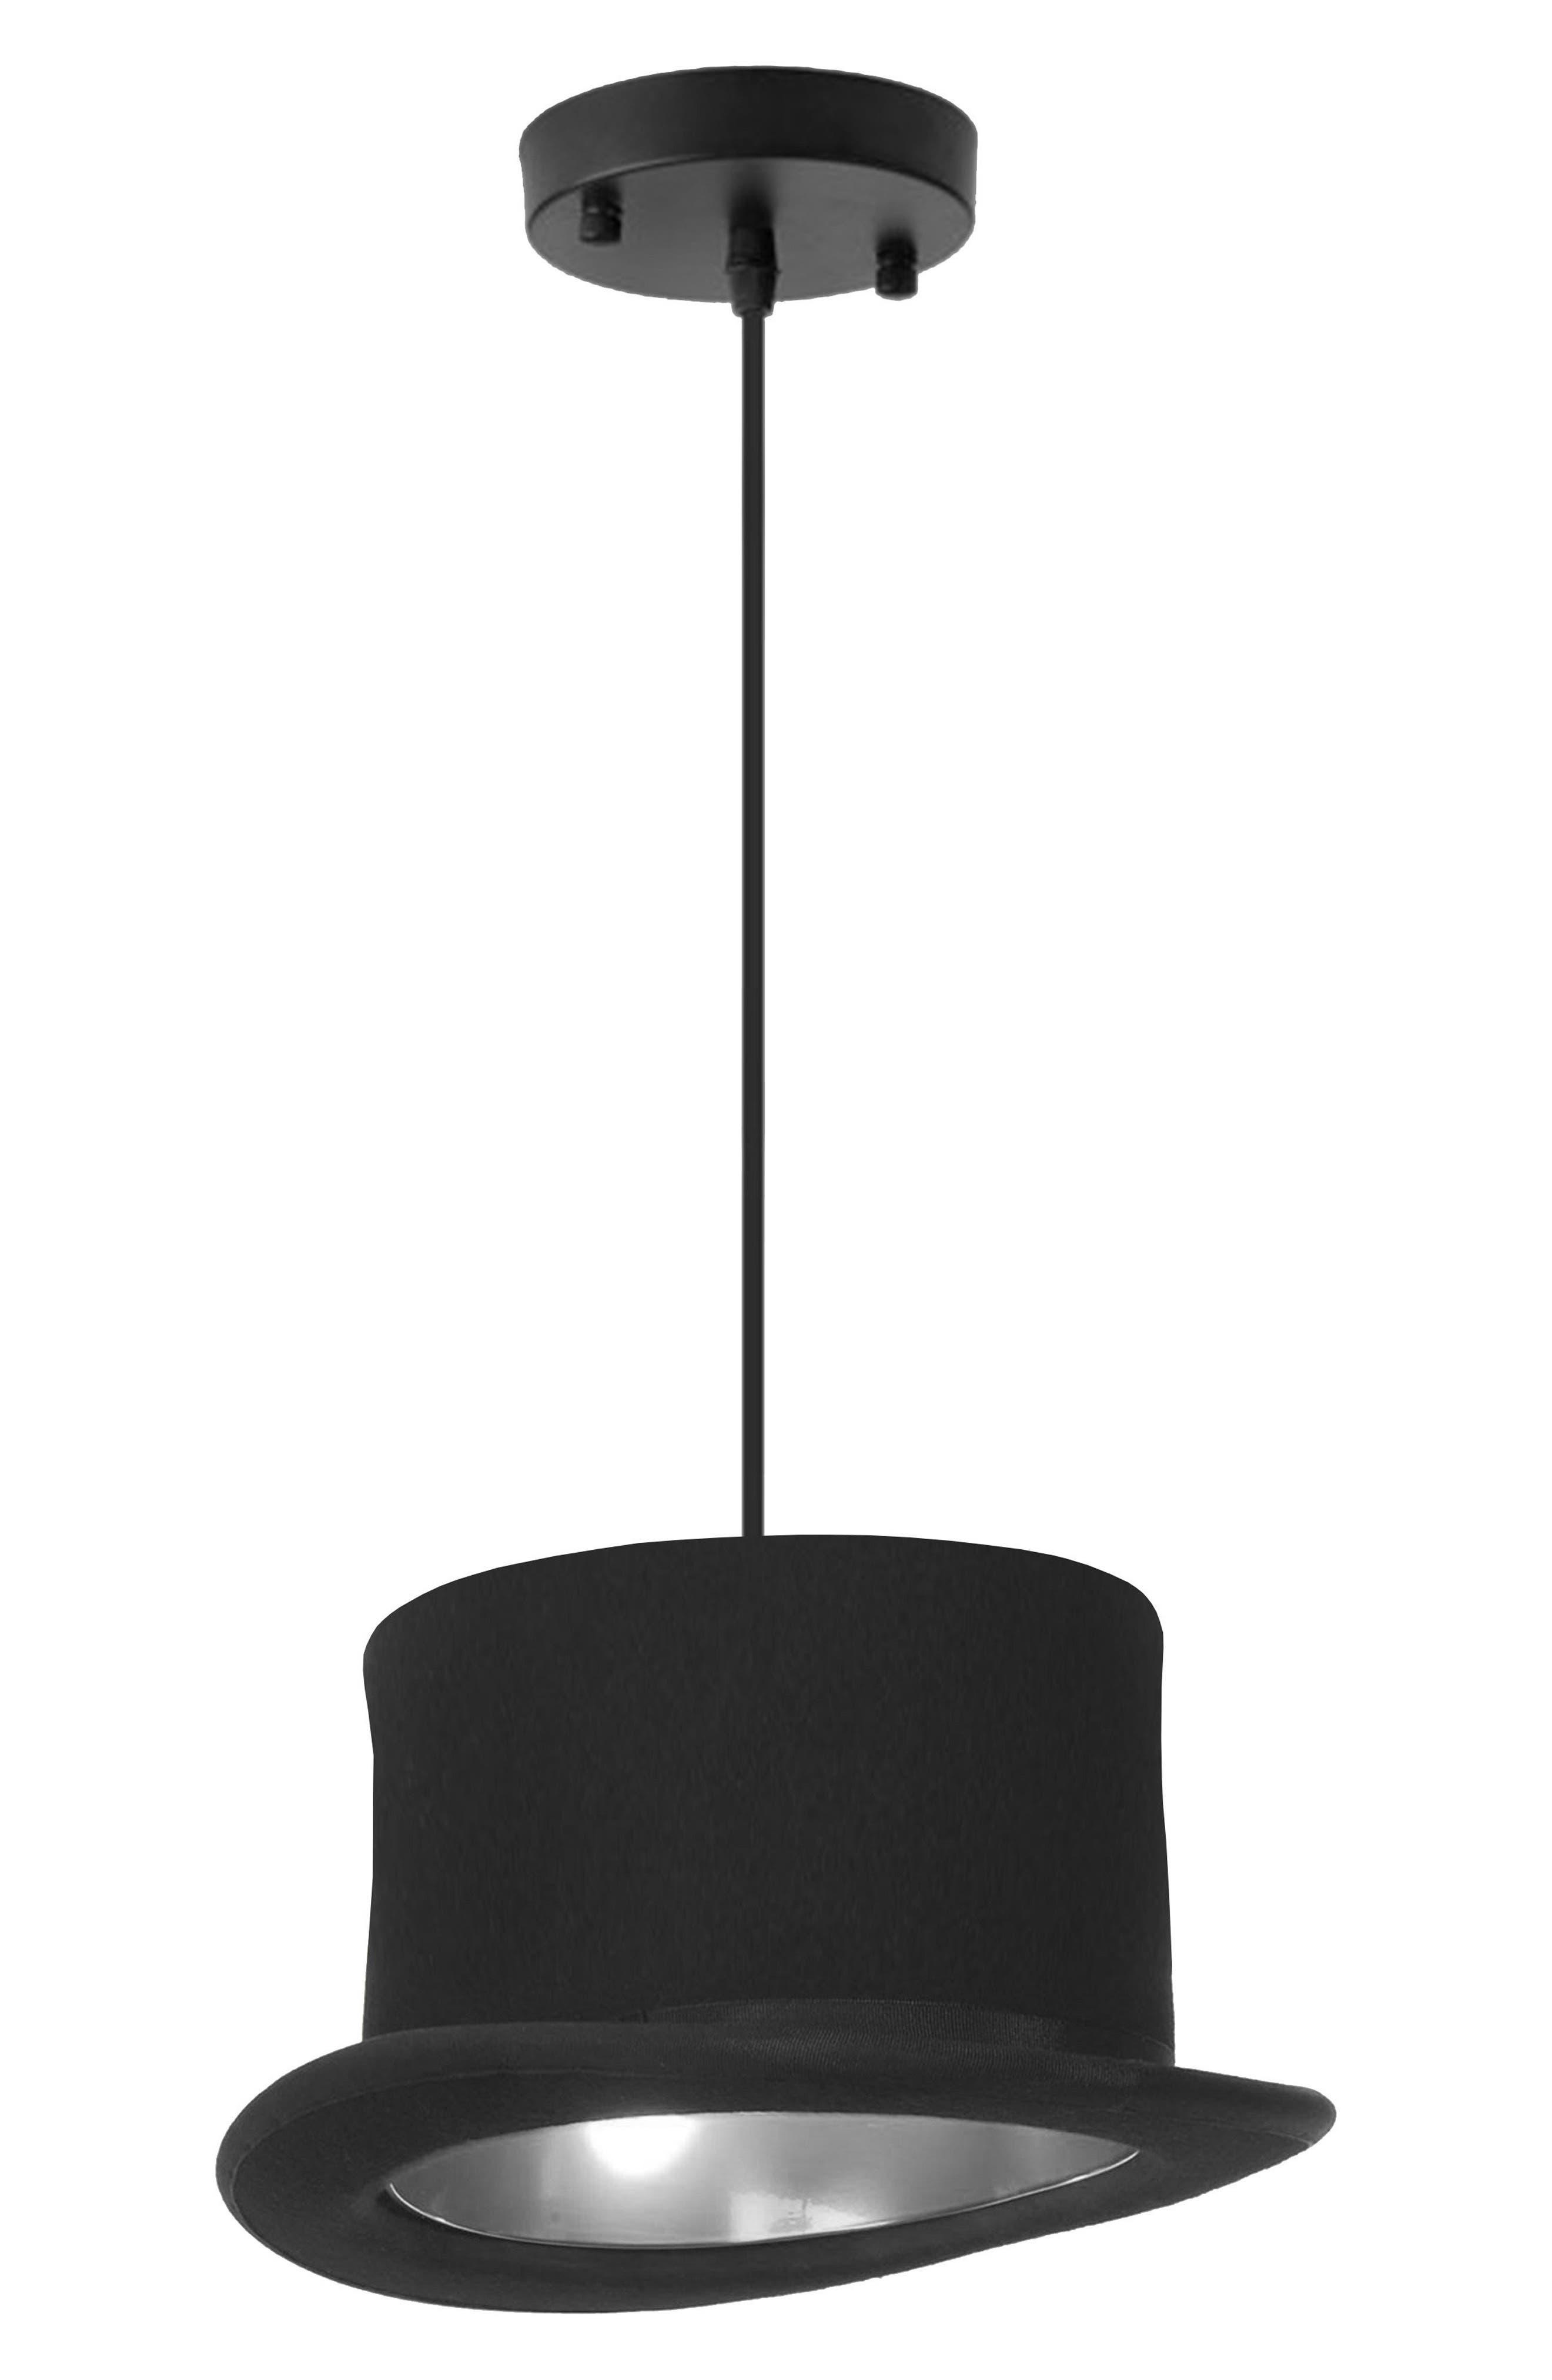 Langley Top Hat Ceiling Fixture,                         Main,                         color, Black